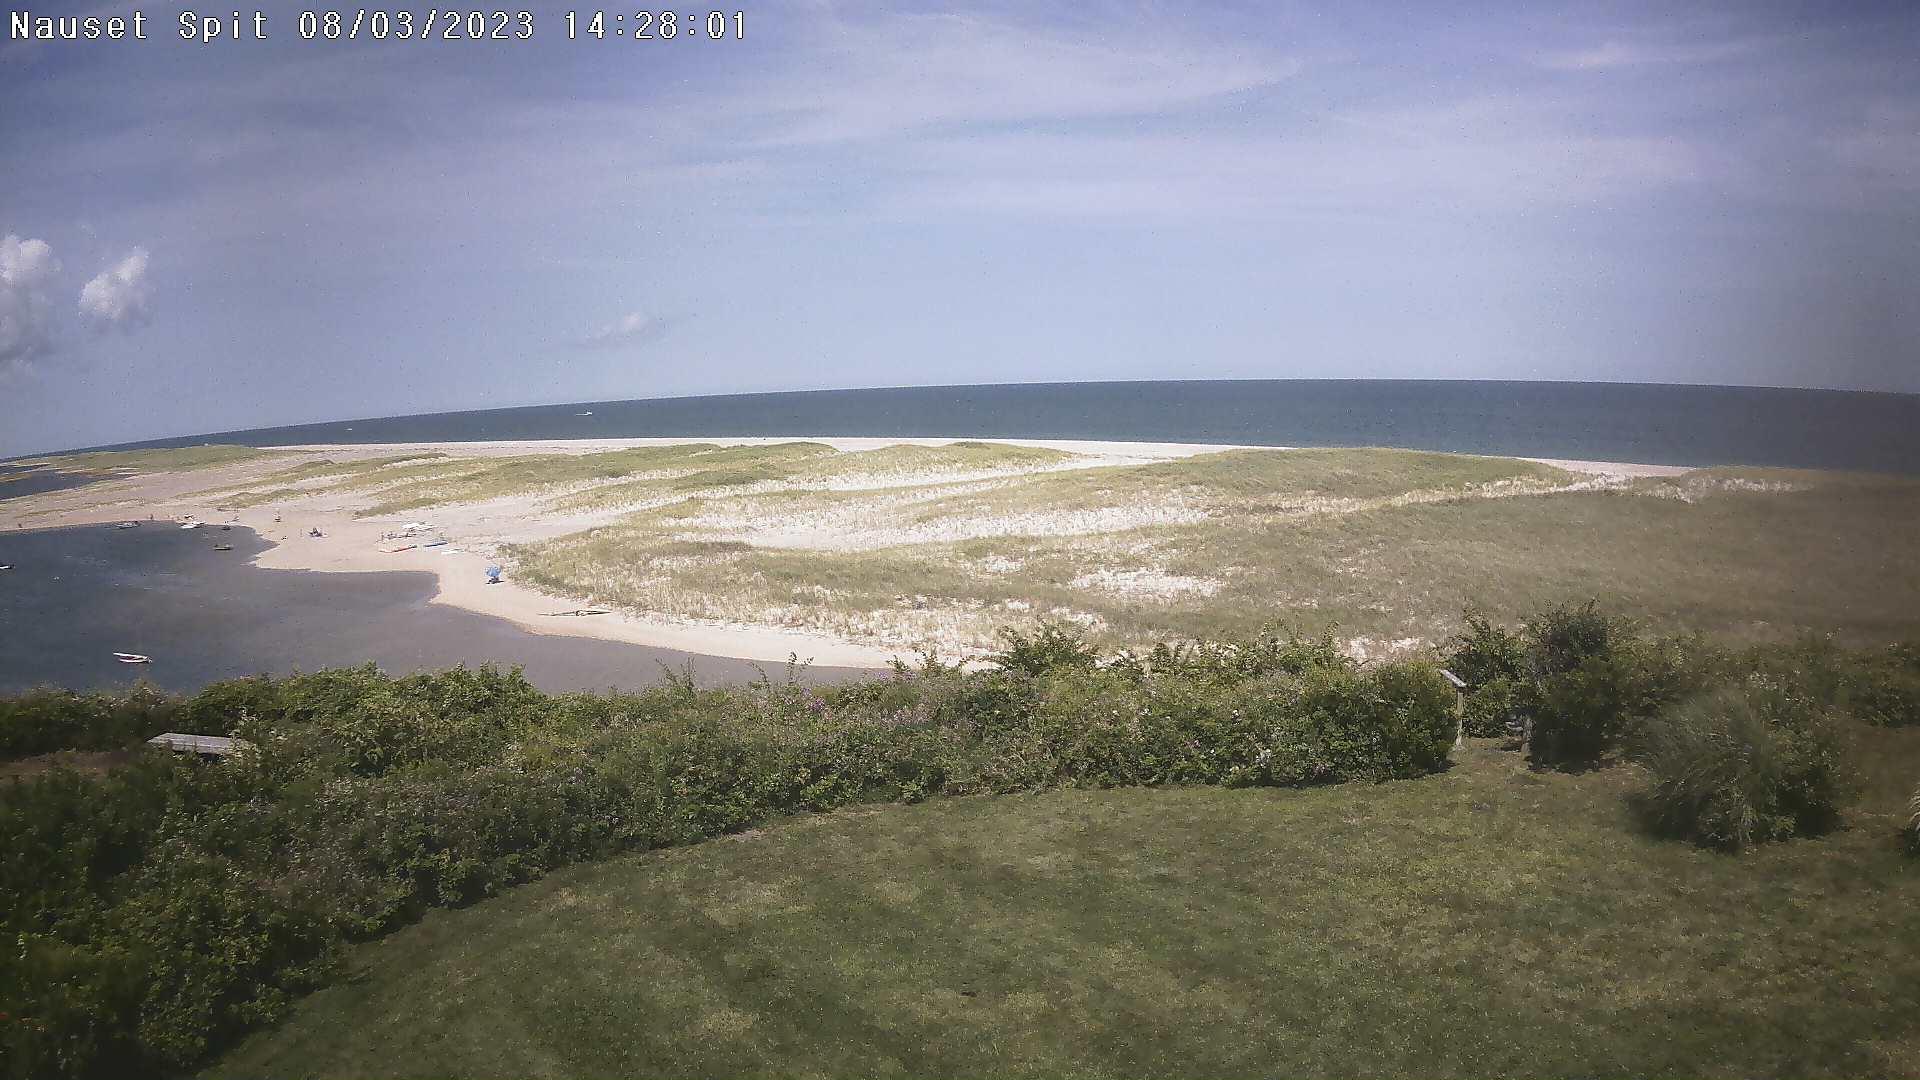 Nauset Beach Webcam, Orleans, MA